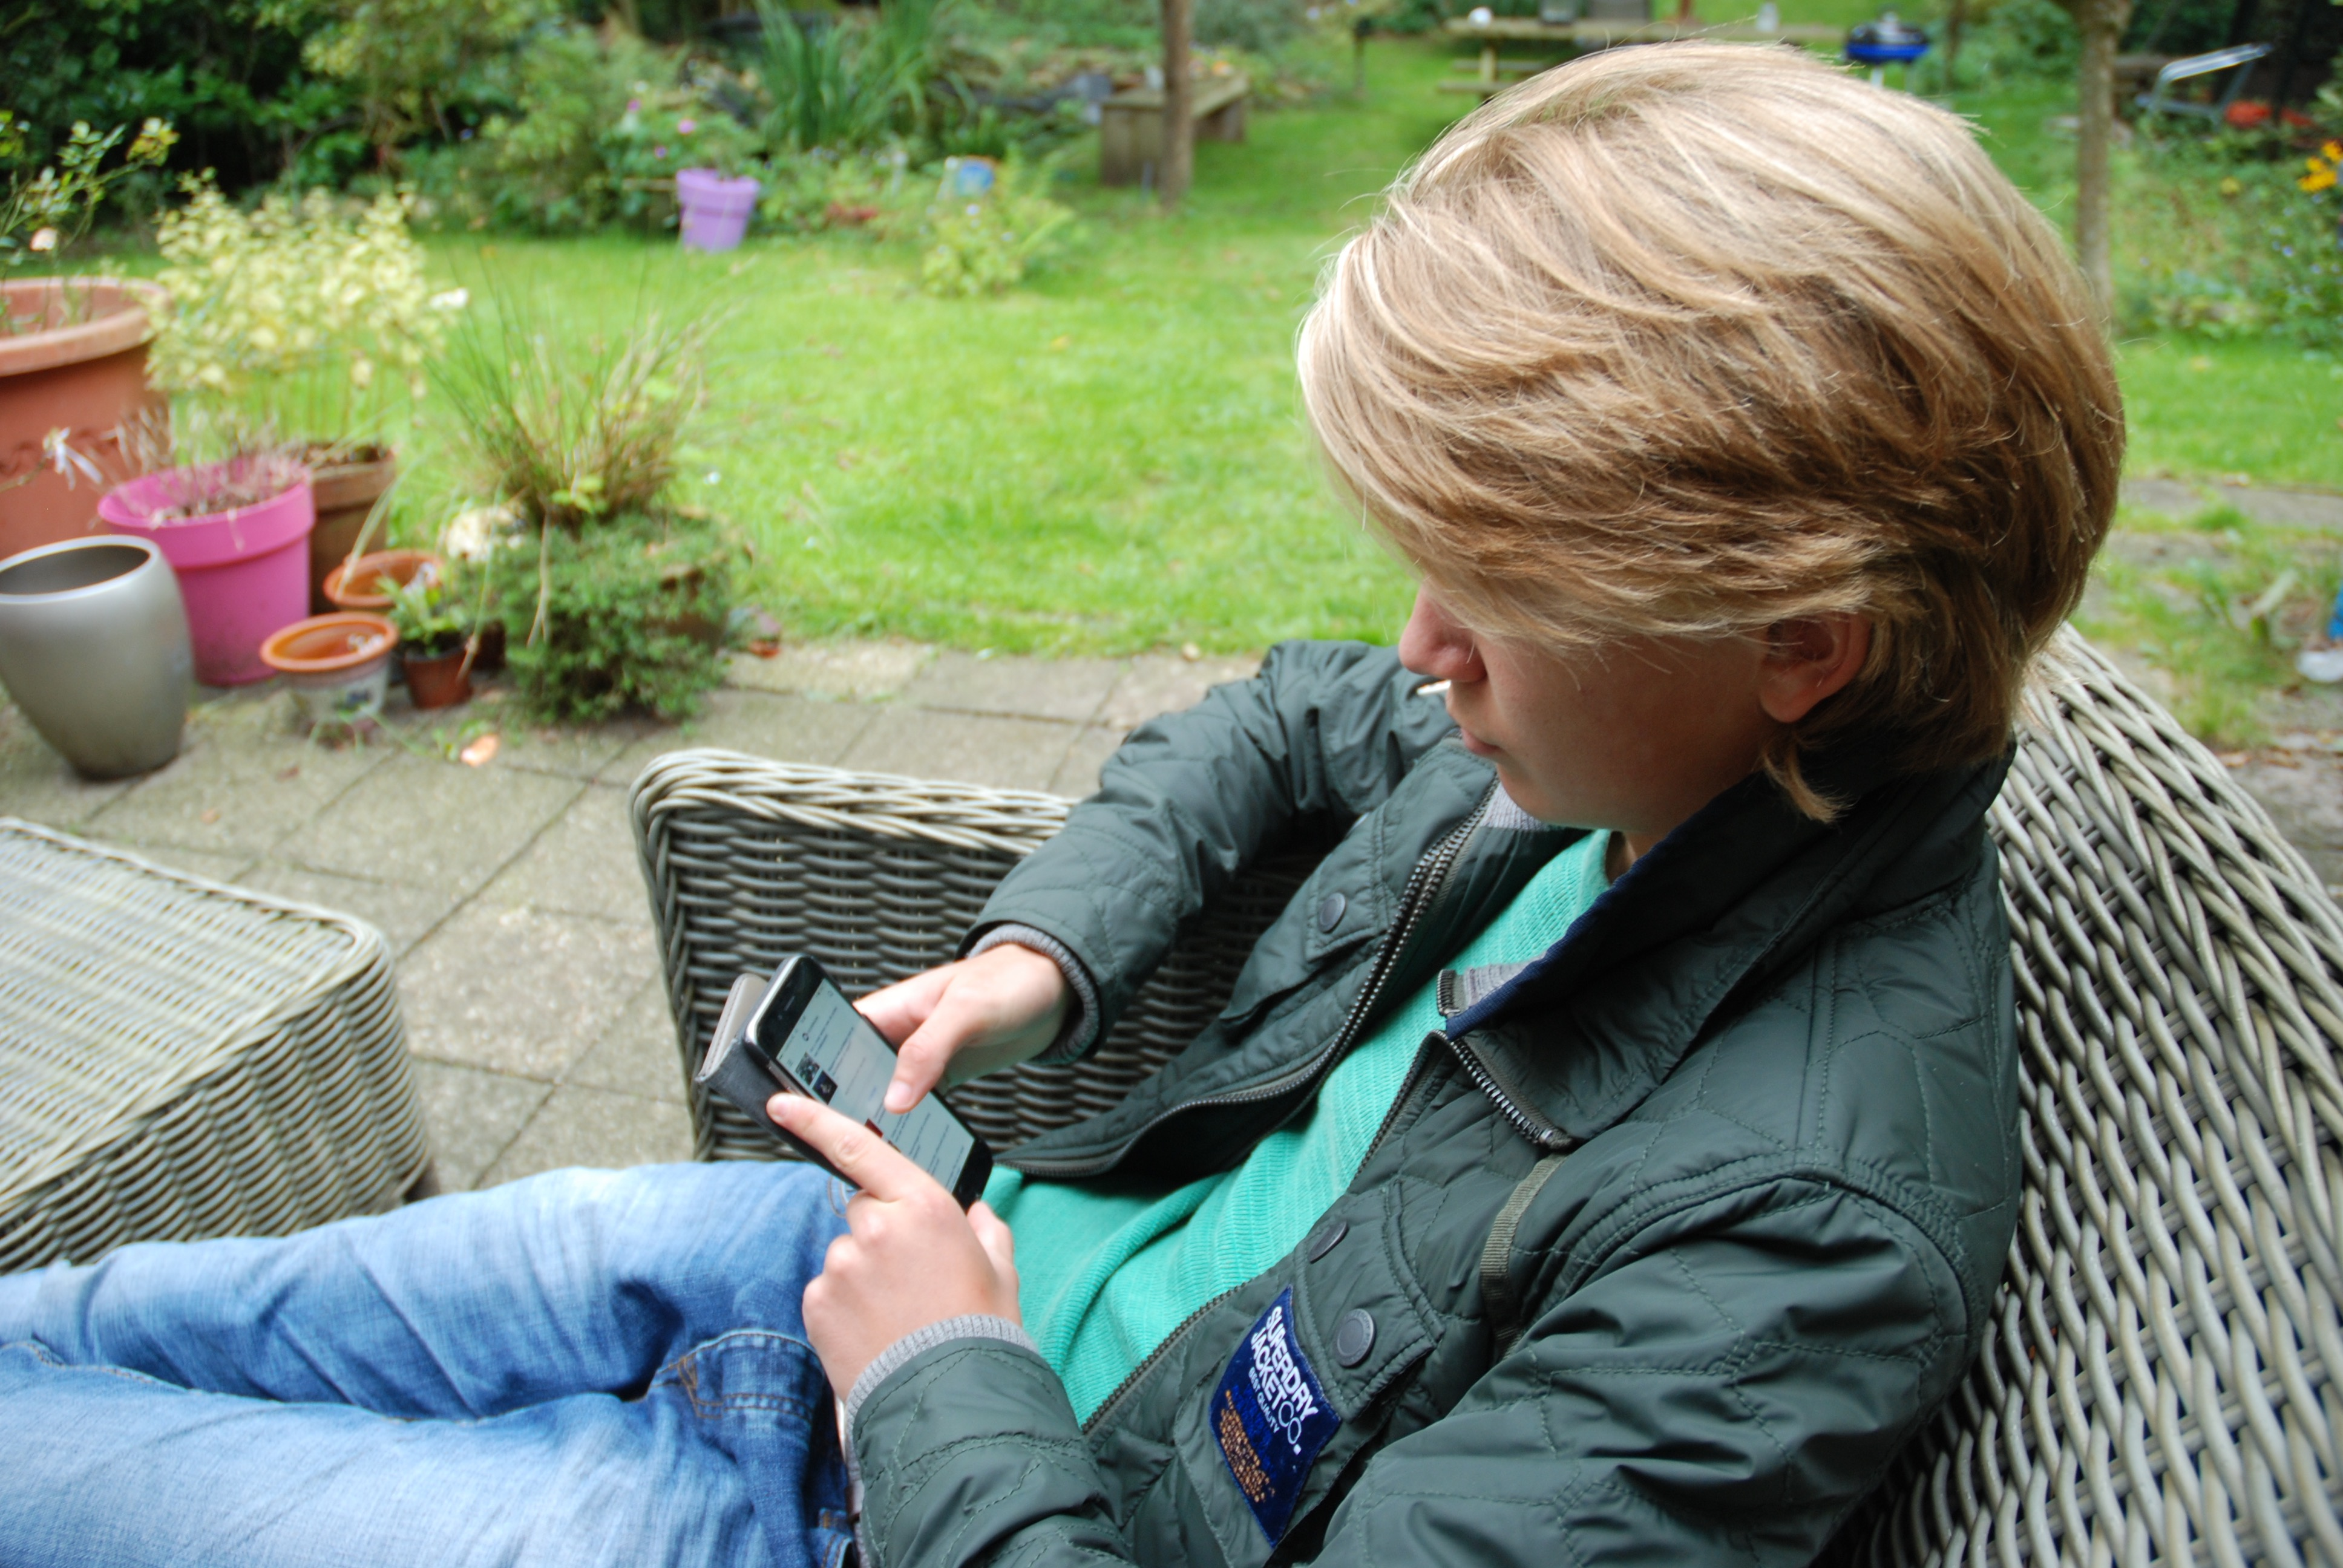 socialmedia bij pubers